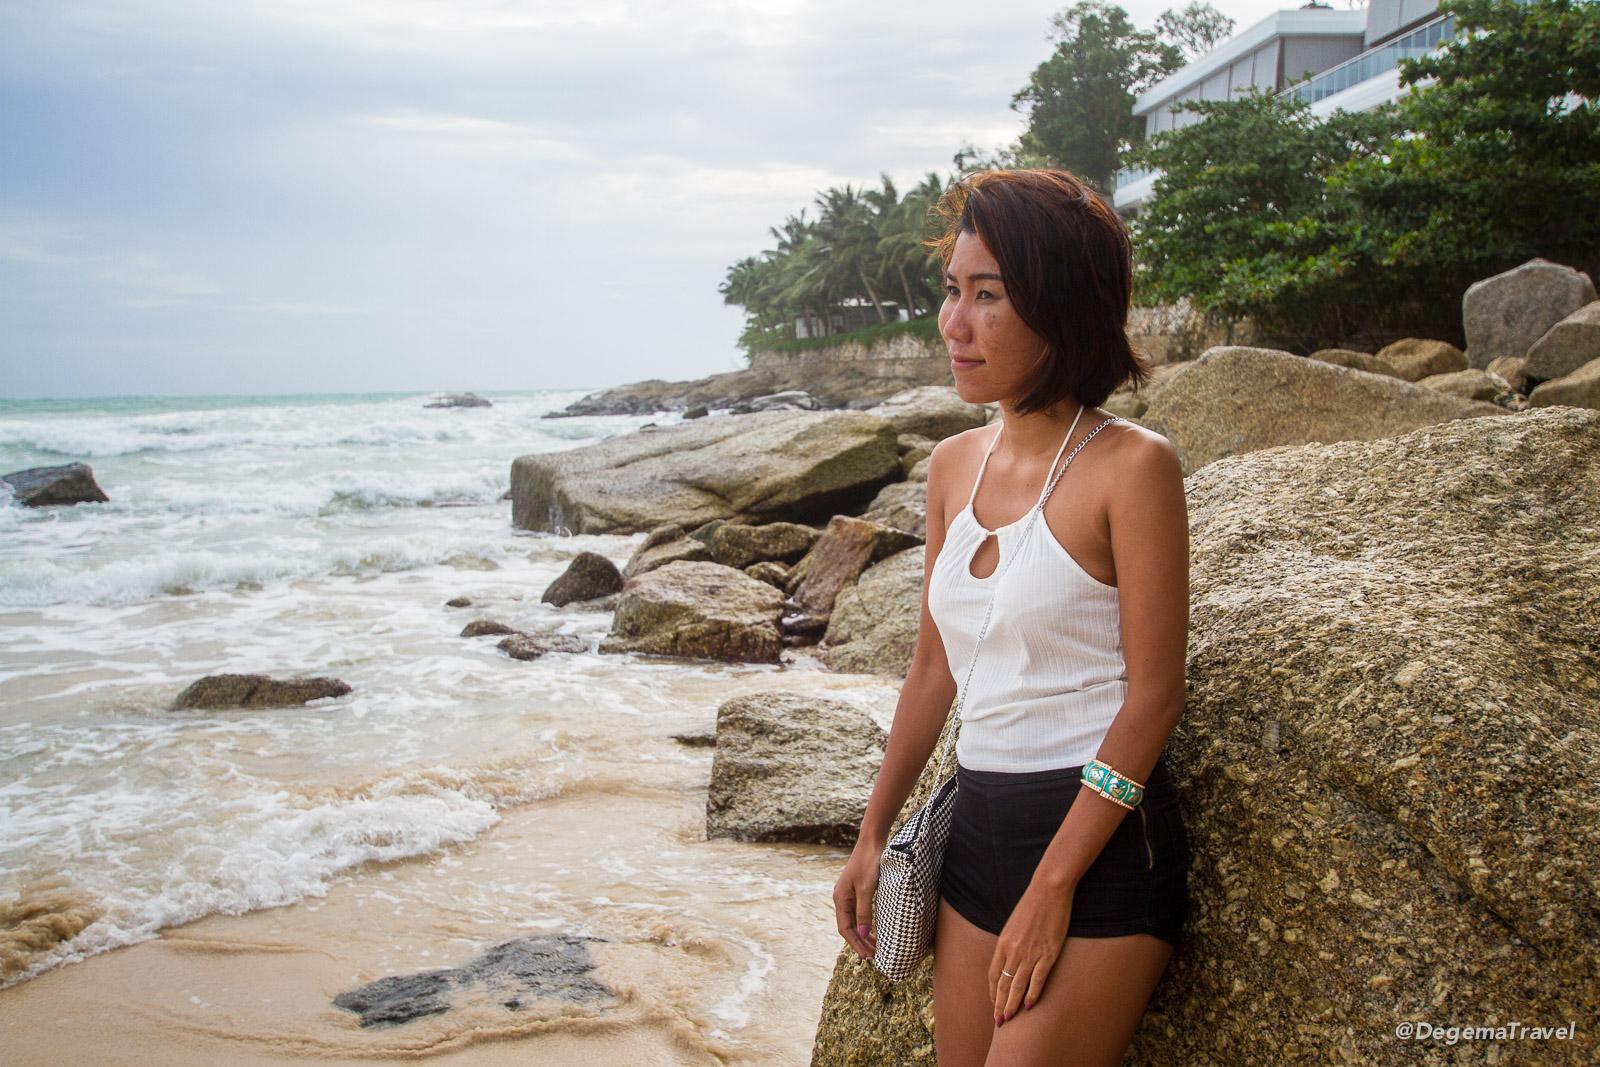 Jeab on Nai Harn Beach in Phuket, Thailand